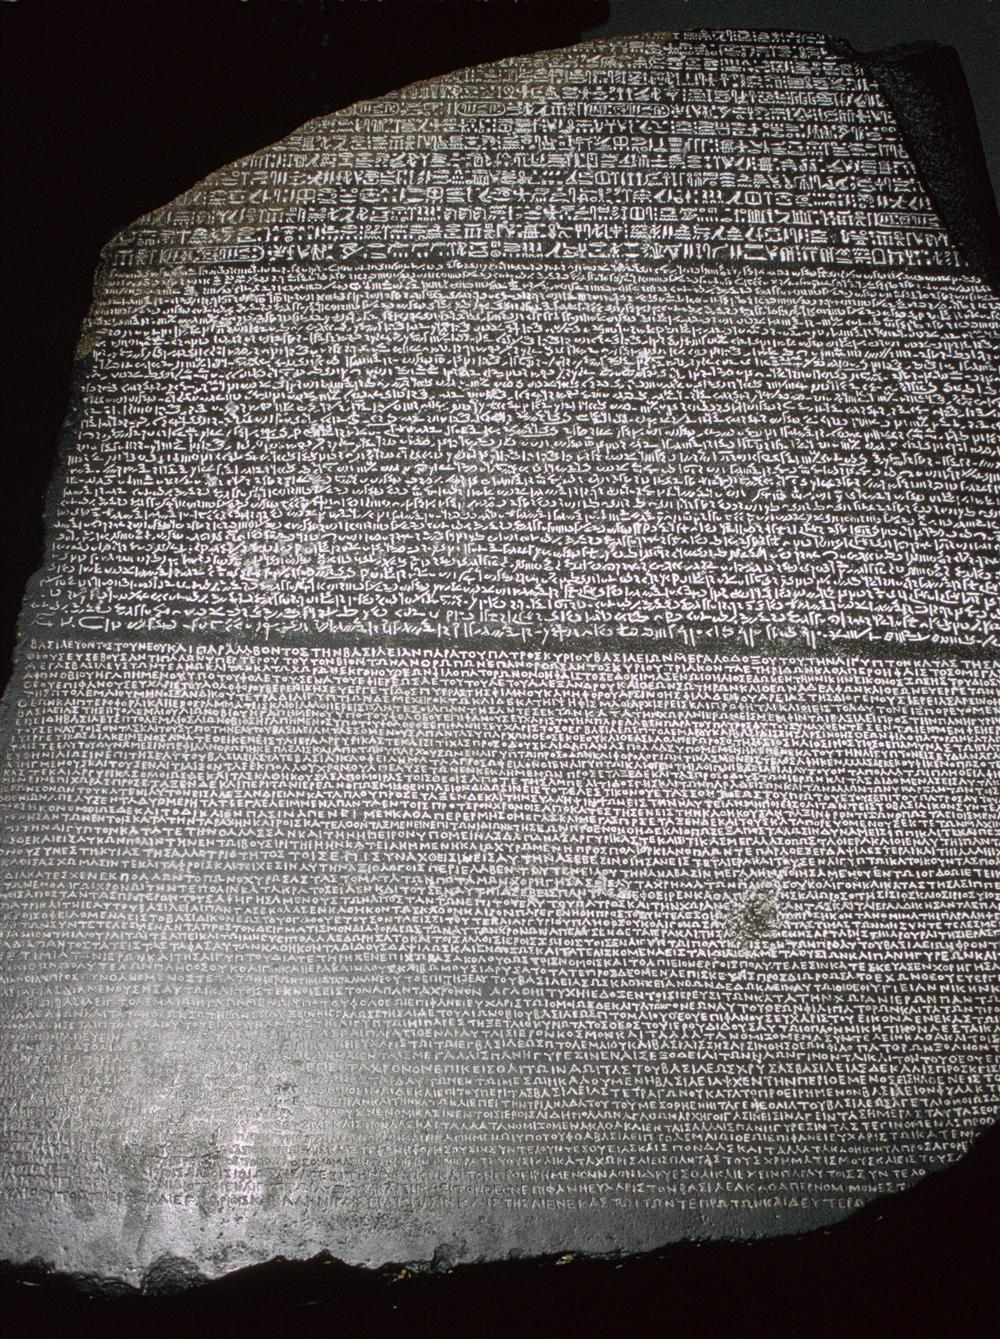 Forum Traiani piedra de Rosetta Hieroglyf/ón egipcio entziffert de Jean-Francois Champollion Decoraci/ón de pared de roseta en Egipto 1799 cimientos como piedra en relieve de yeso